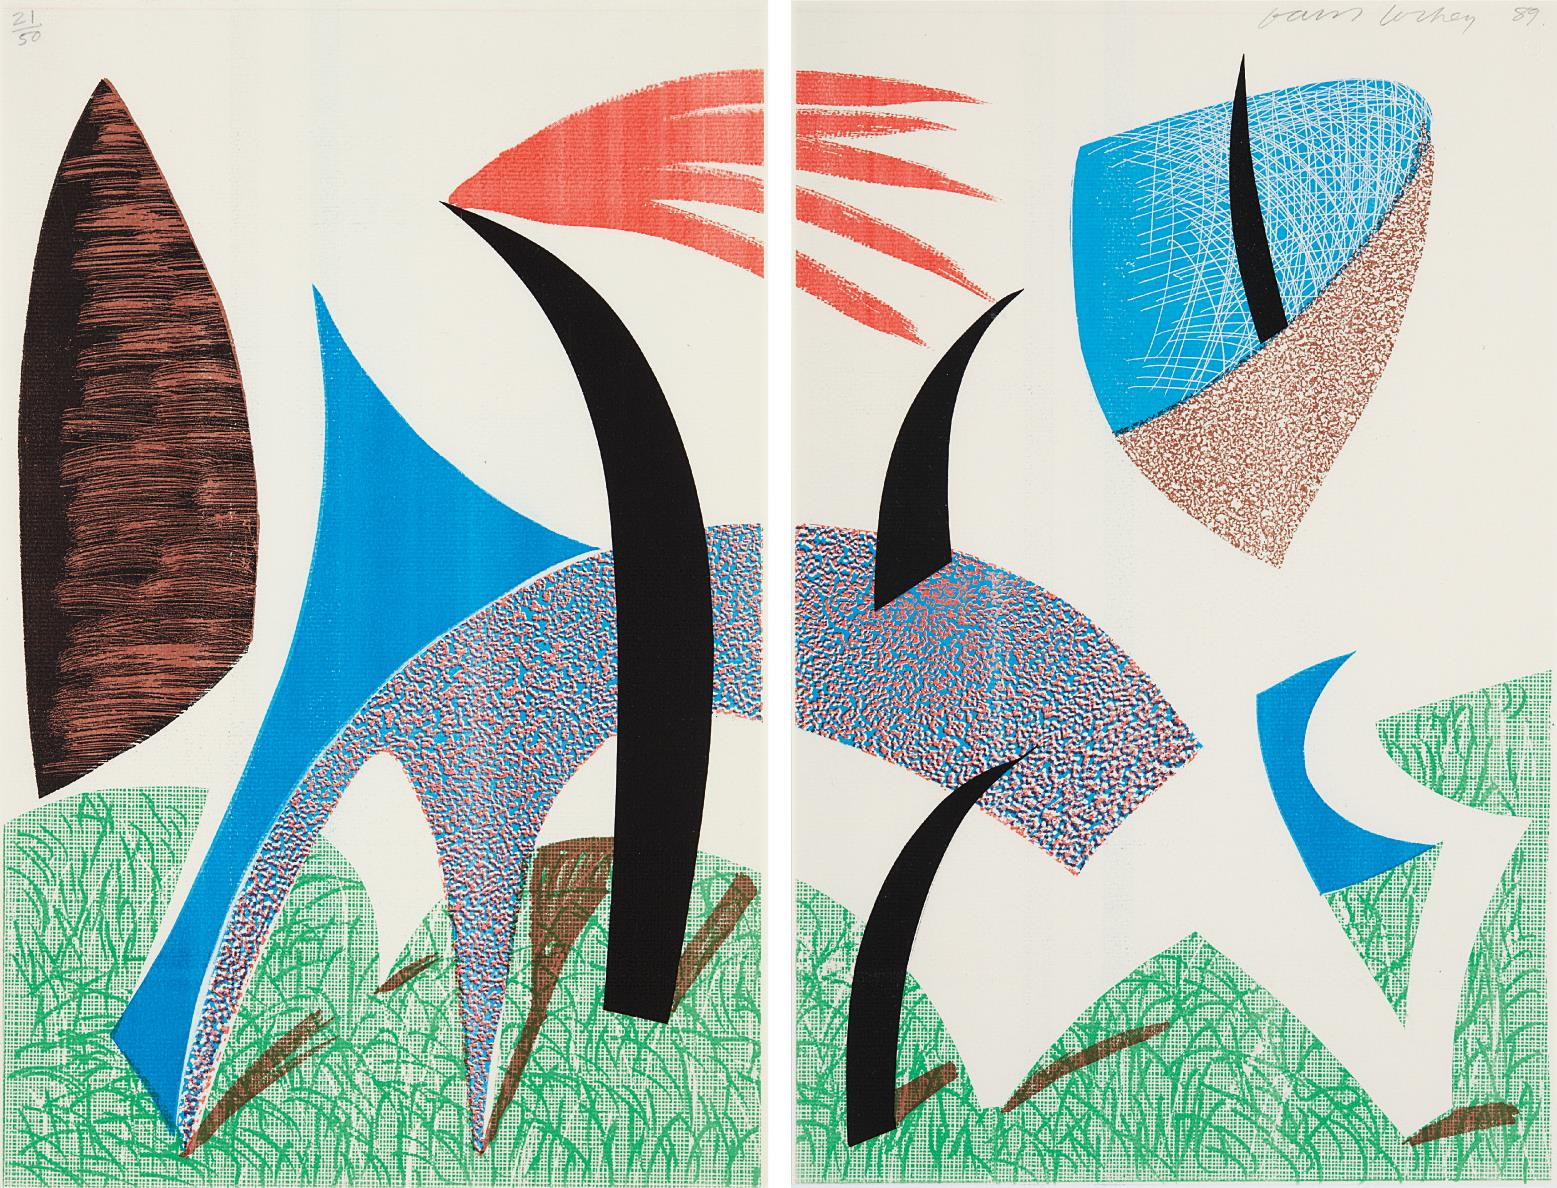 David Hockney-Diptychon-1989